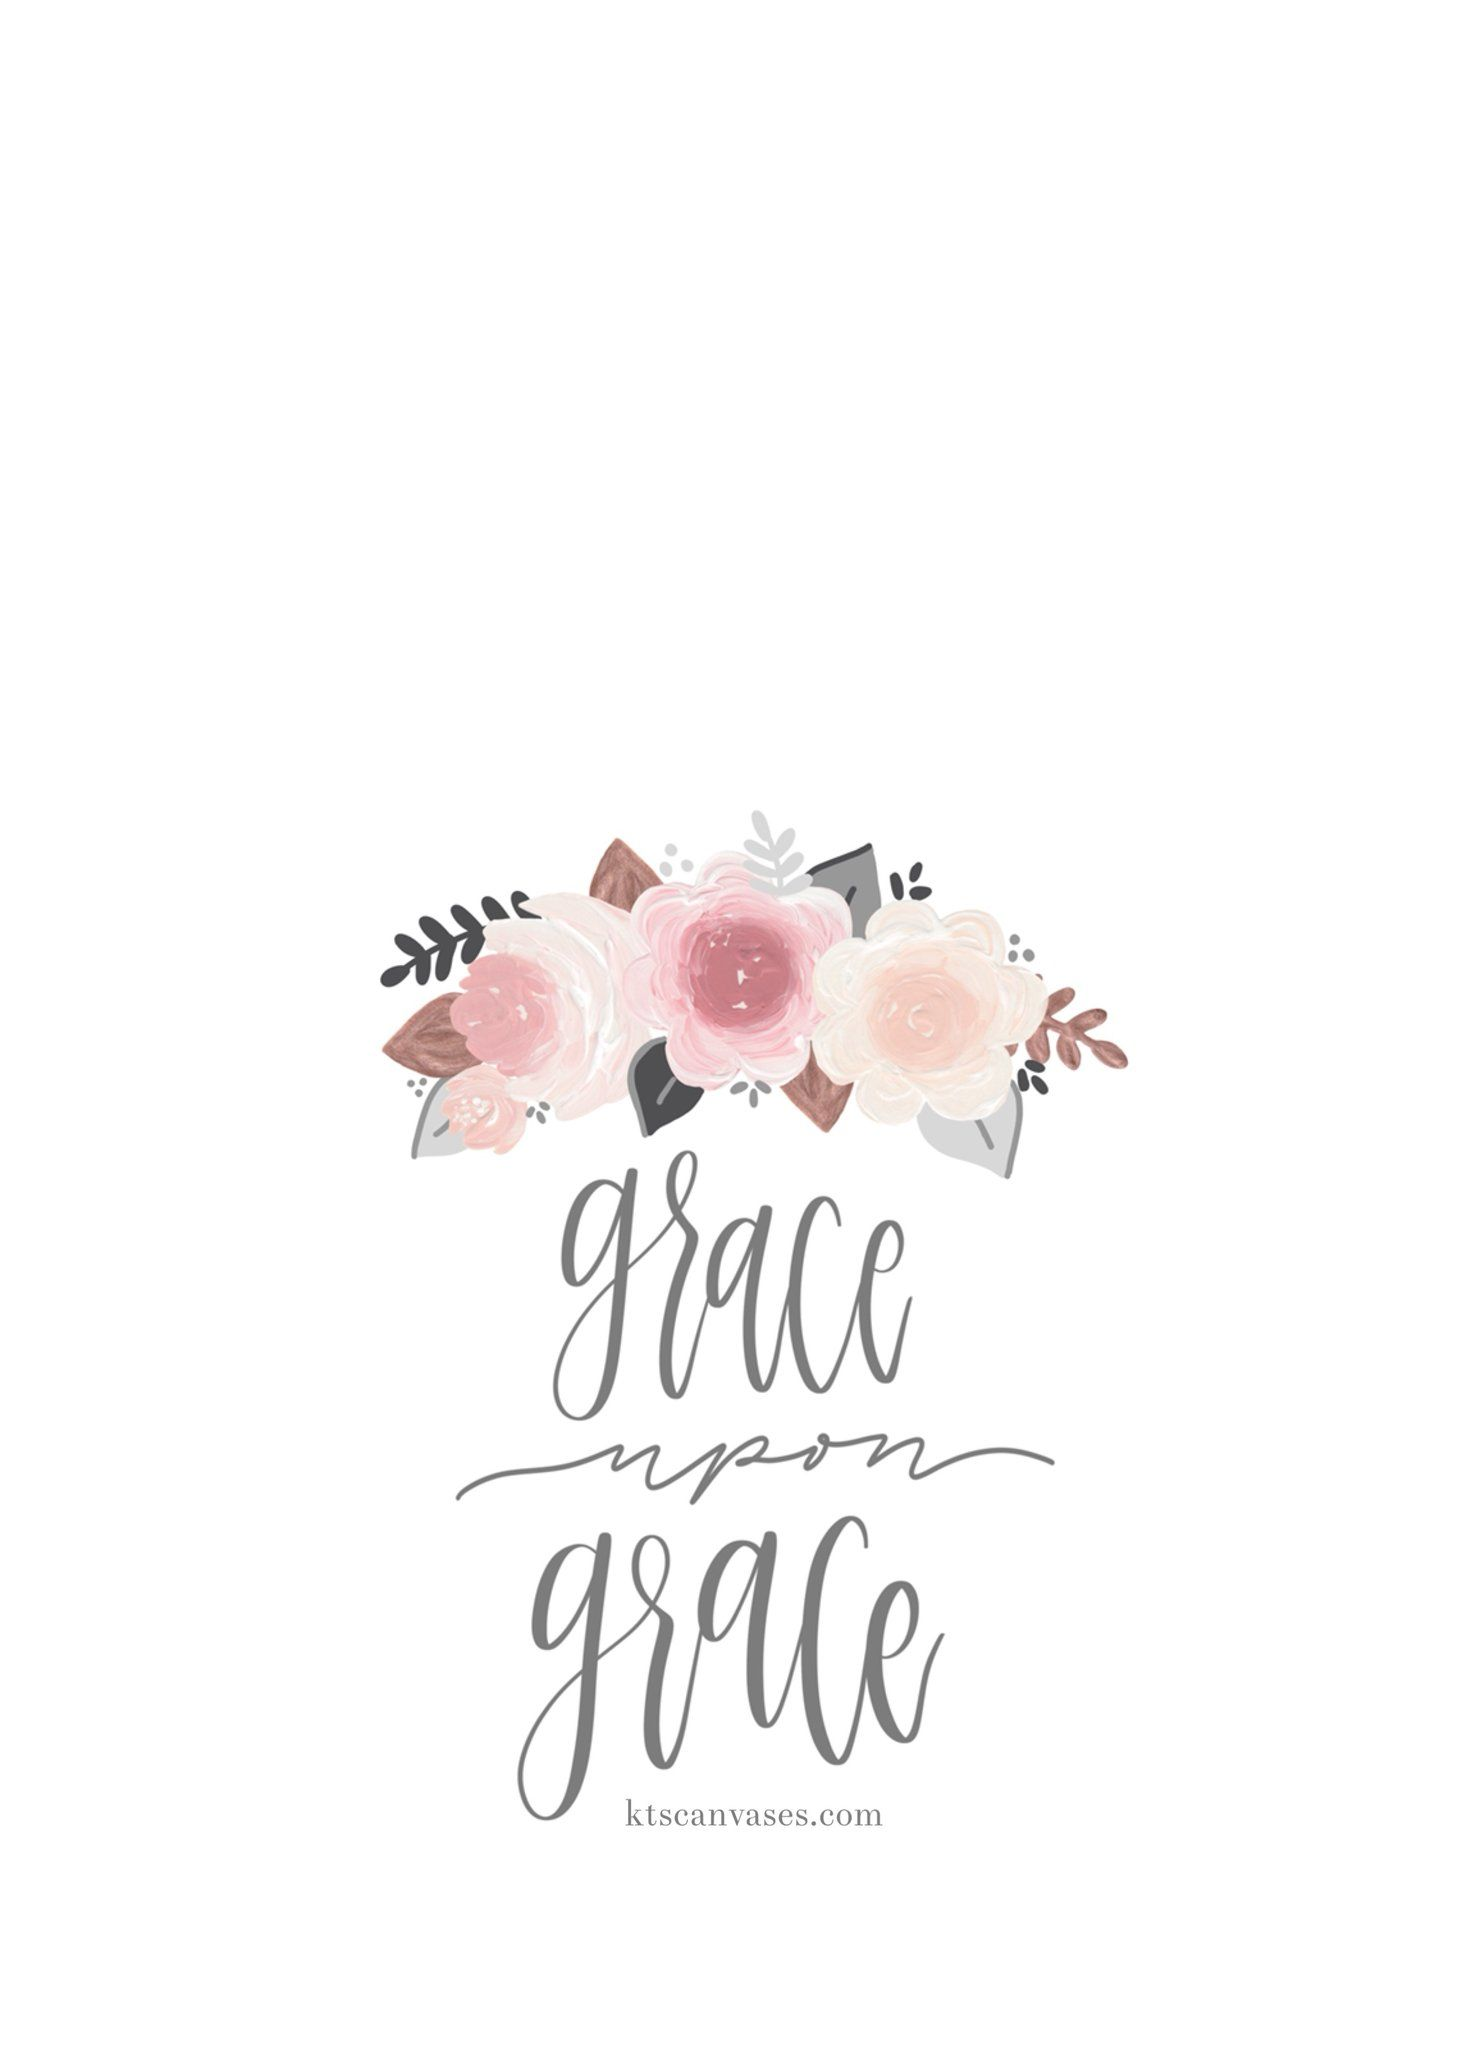 Grace Upon Grace Wallpaper 水彩 花 水彩 影